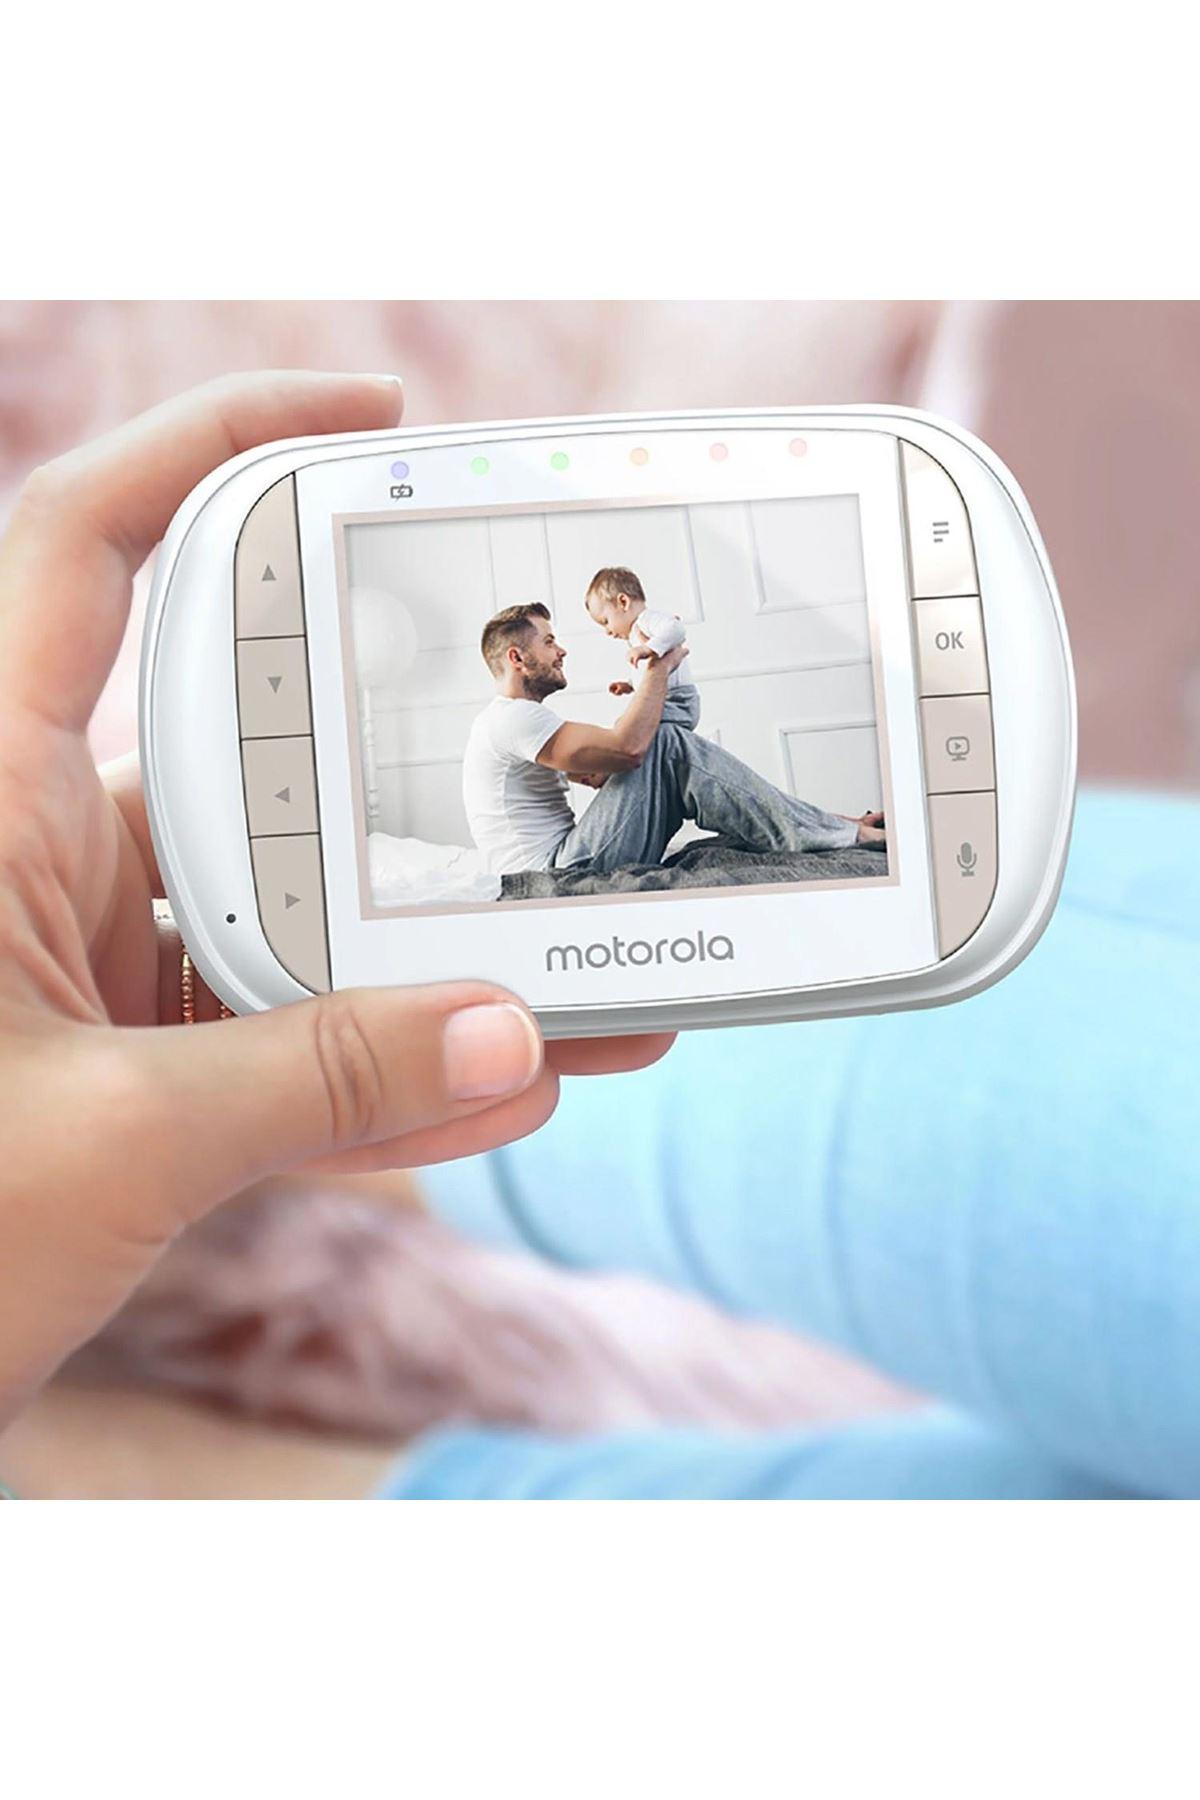 Motorola MBP35XLC Dijital Bebek Kamerası 3.5 İnç LCD Ekran